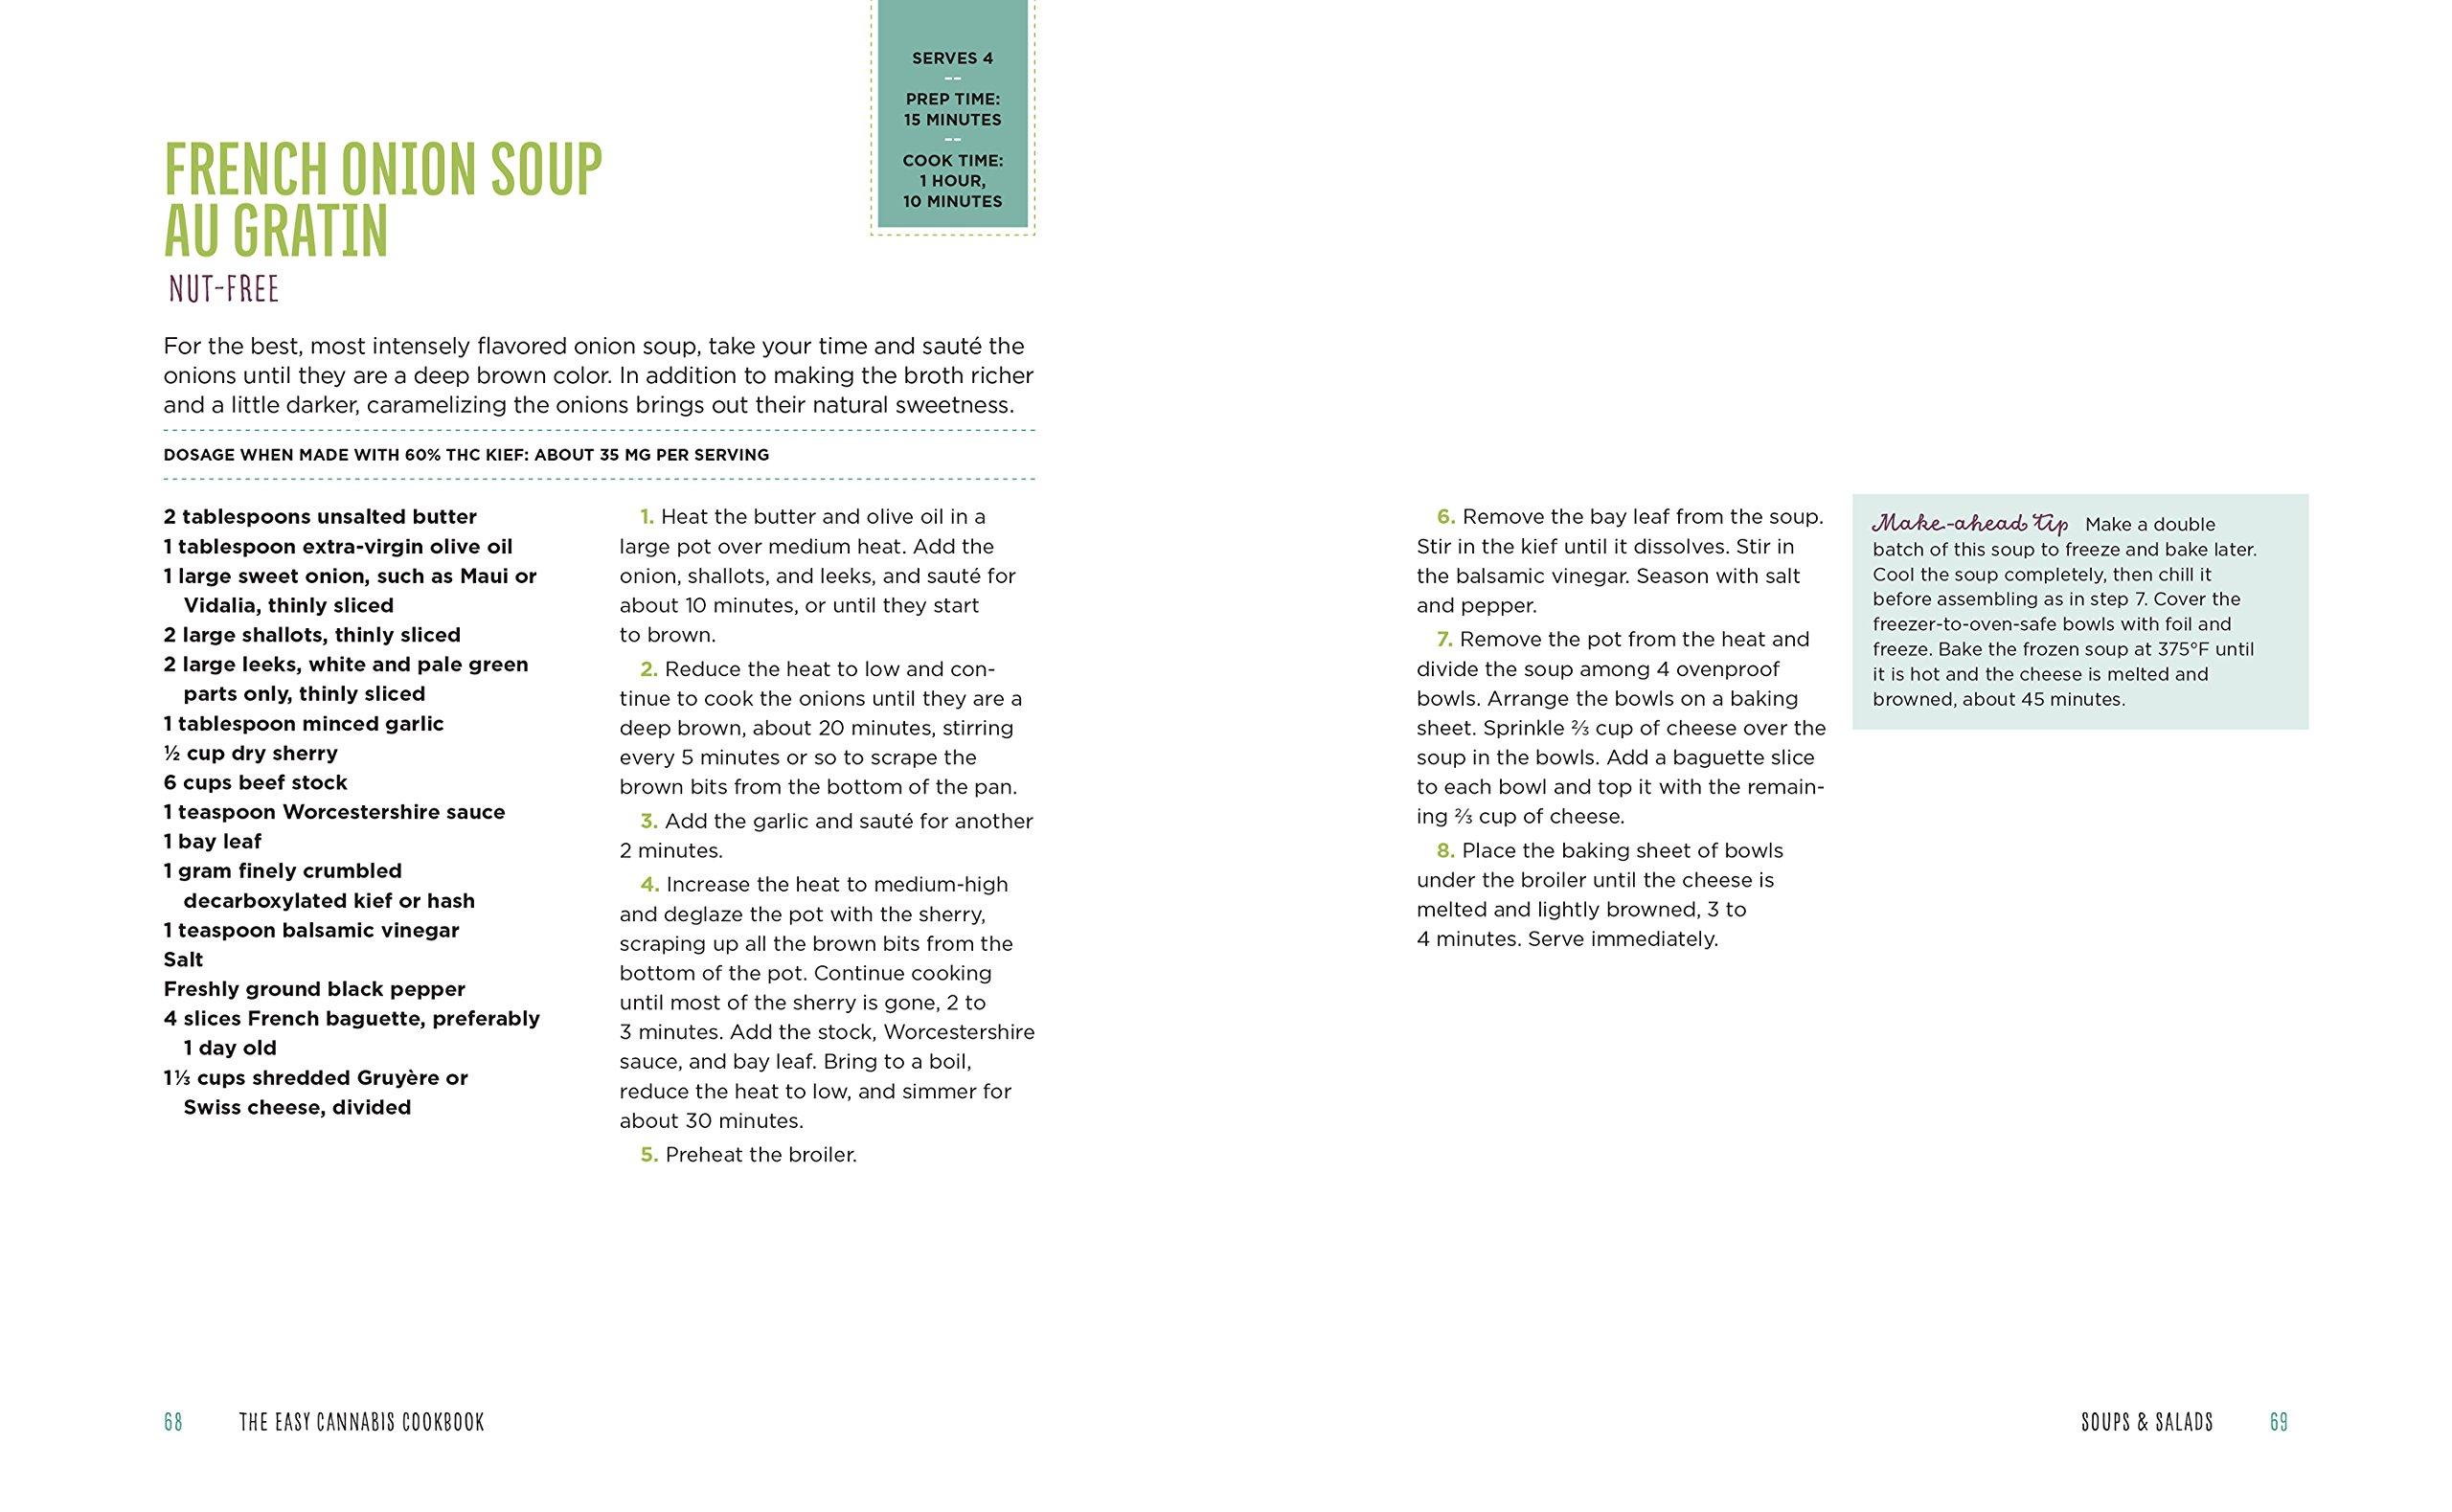 The Easy Cannabis Cookbook: 60+ Medical Marijuana Recipes